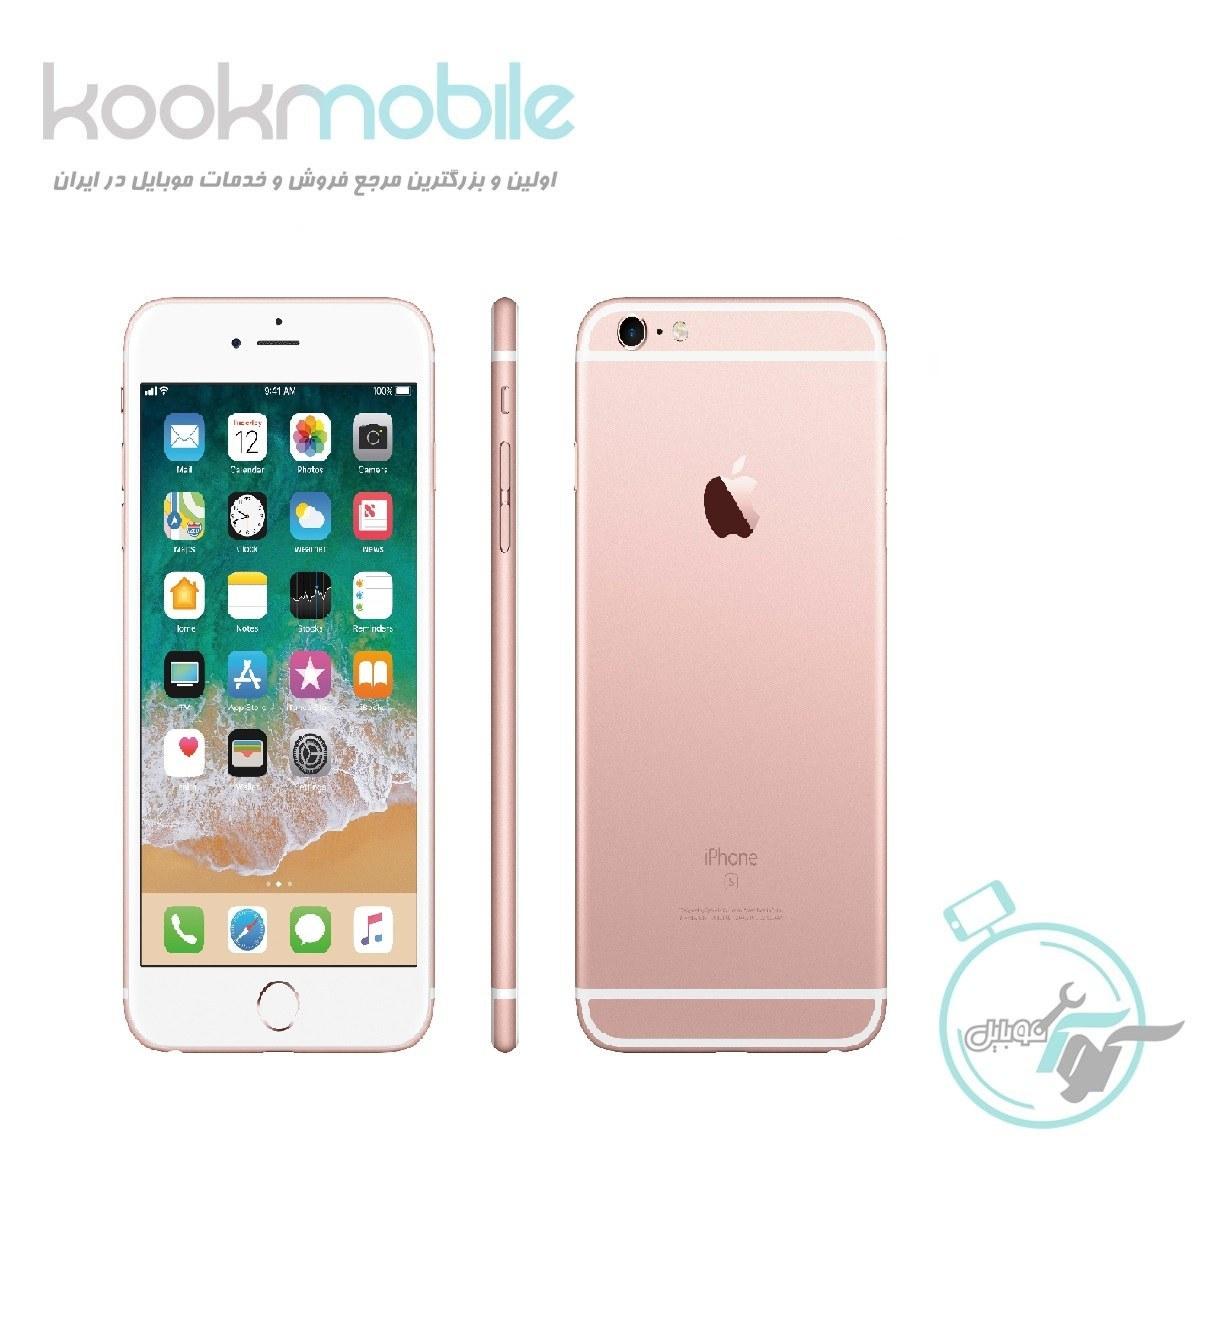 عکس گوشی اپل آیفون 6s Plus   ظرفیت ۳۲ گیگابایت Apple iphone 6s Plus   32GB گوشی-اپل-ایفون-6s-plus-ظرفیت-32-گیگابایت